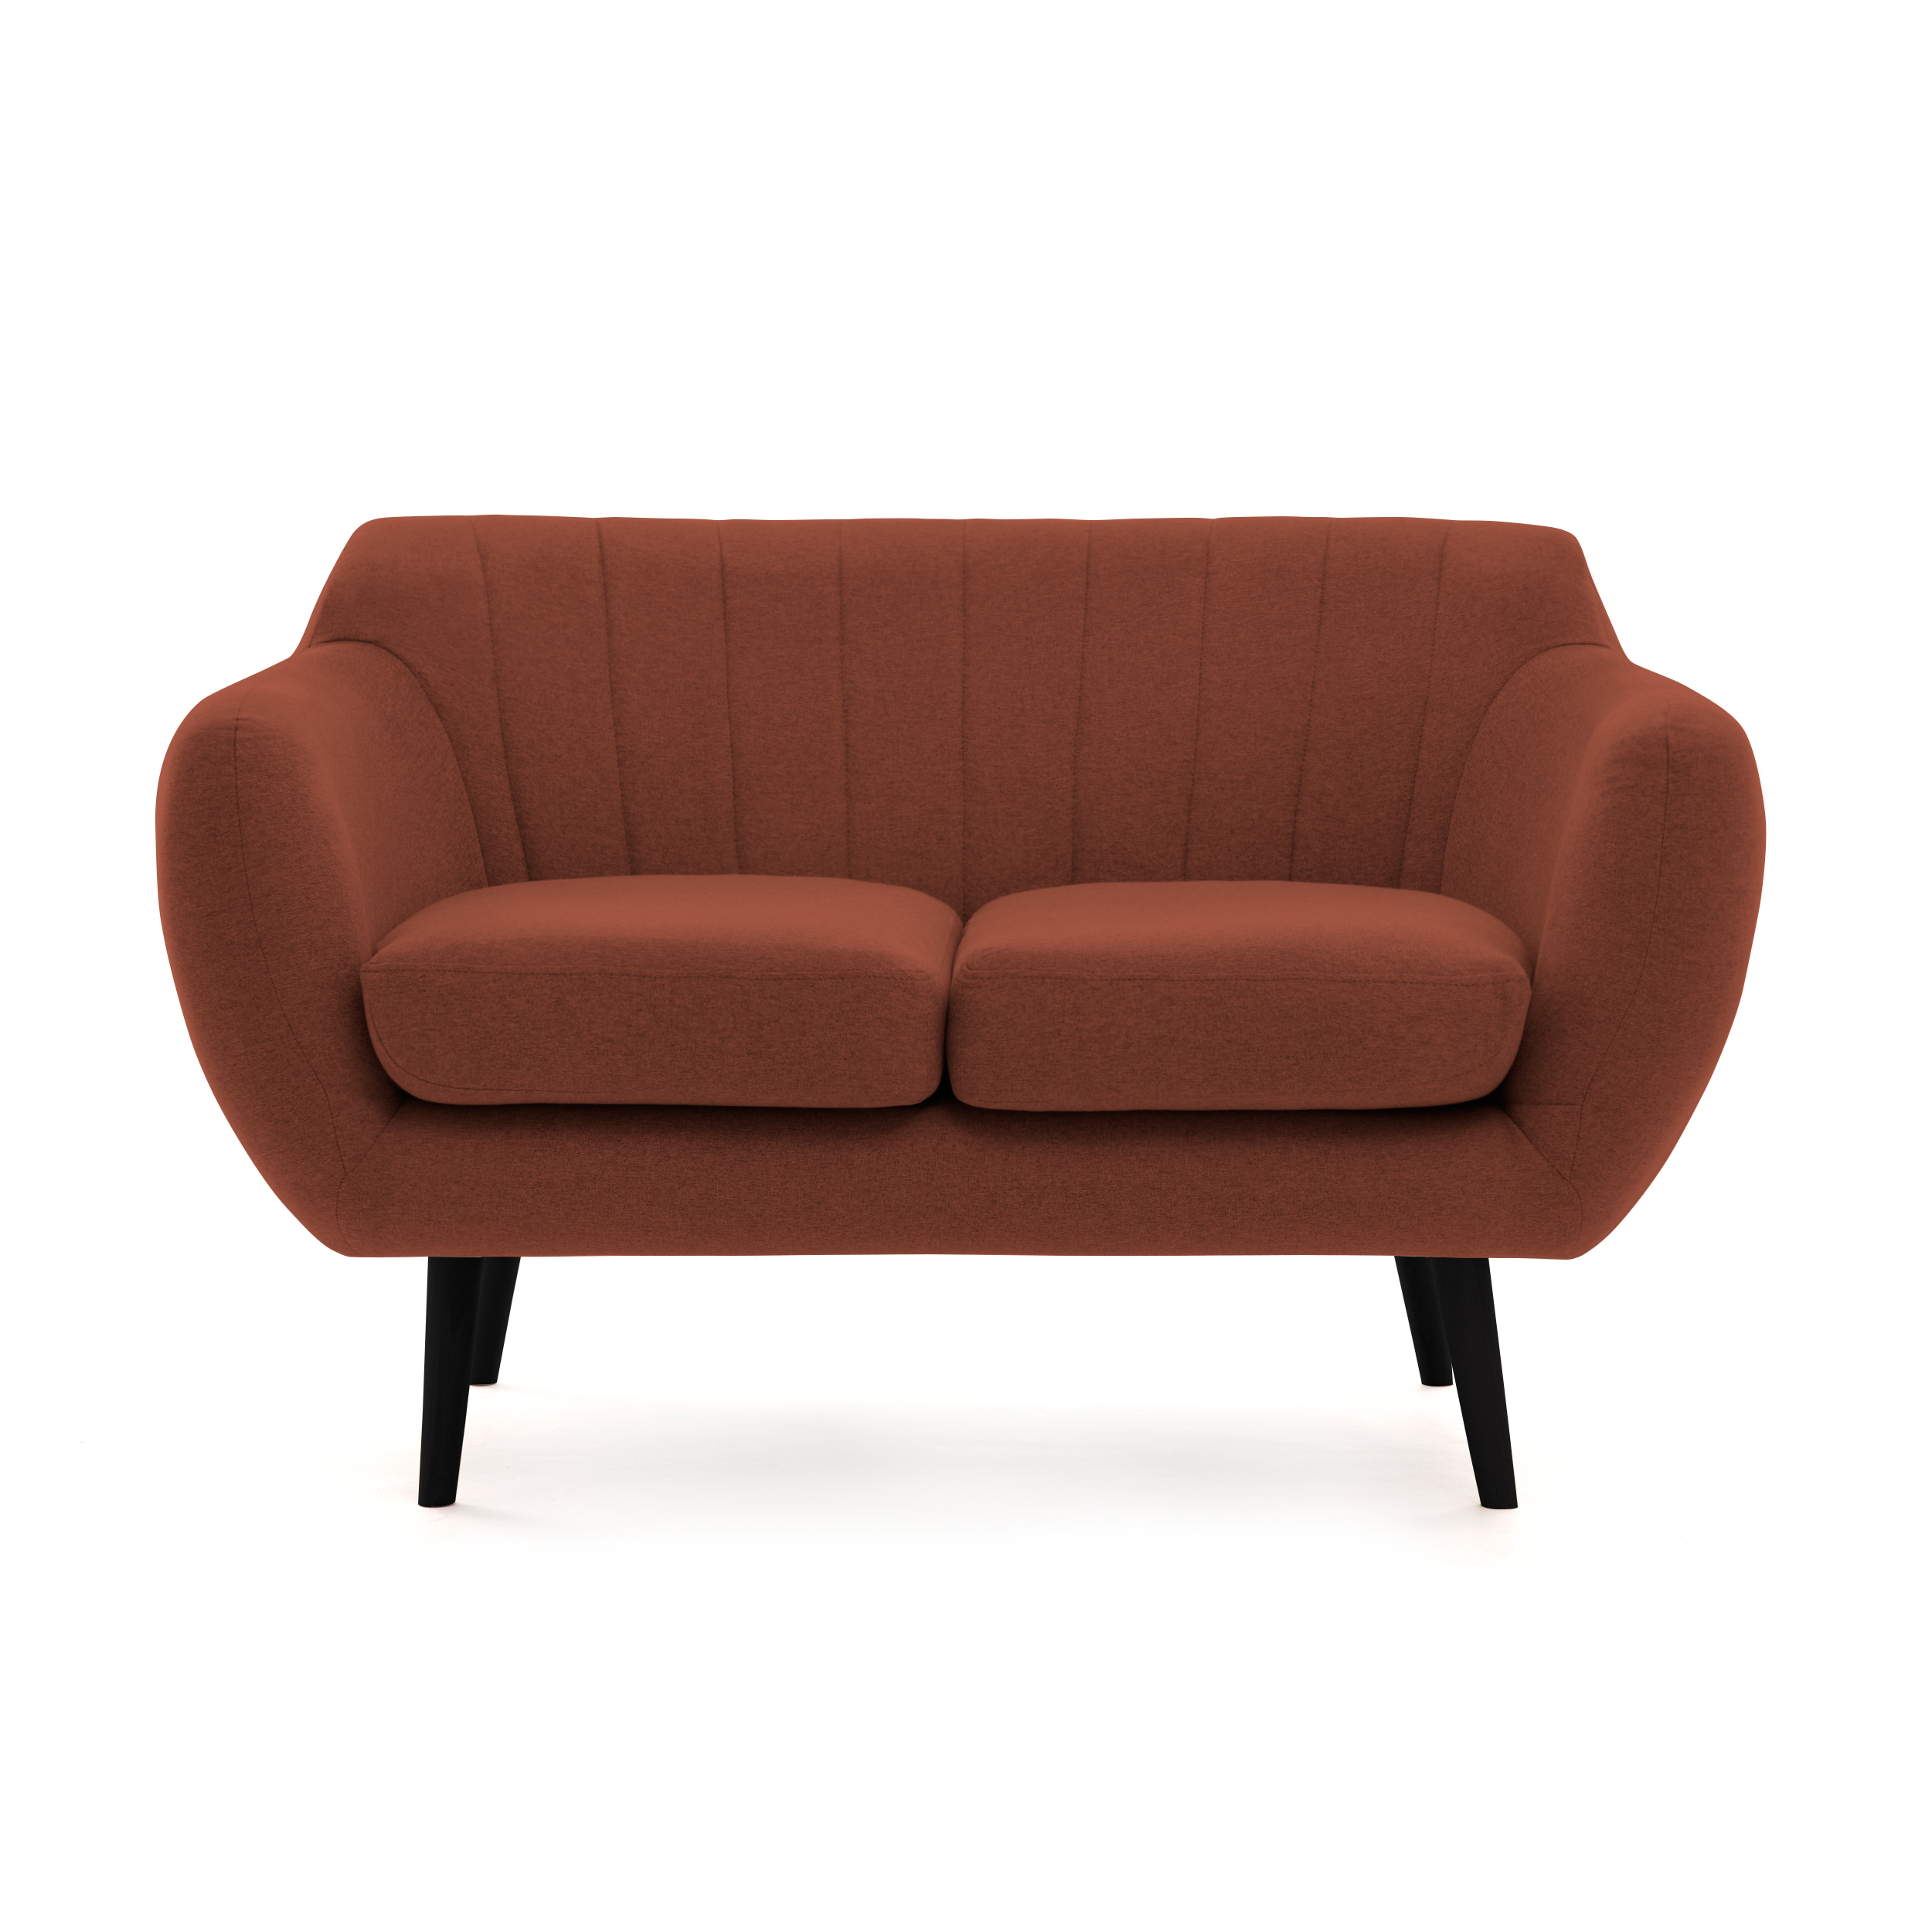 Canapea Fixa 2 locuri Kennet Marsala II